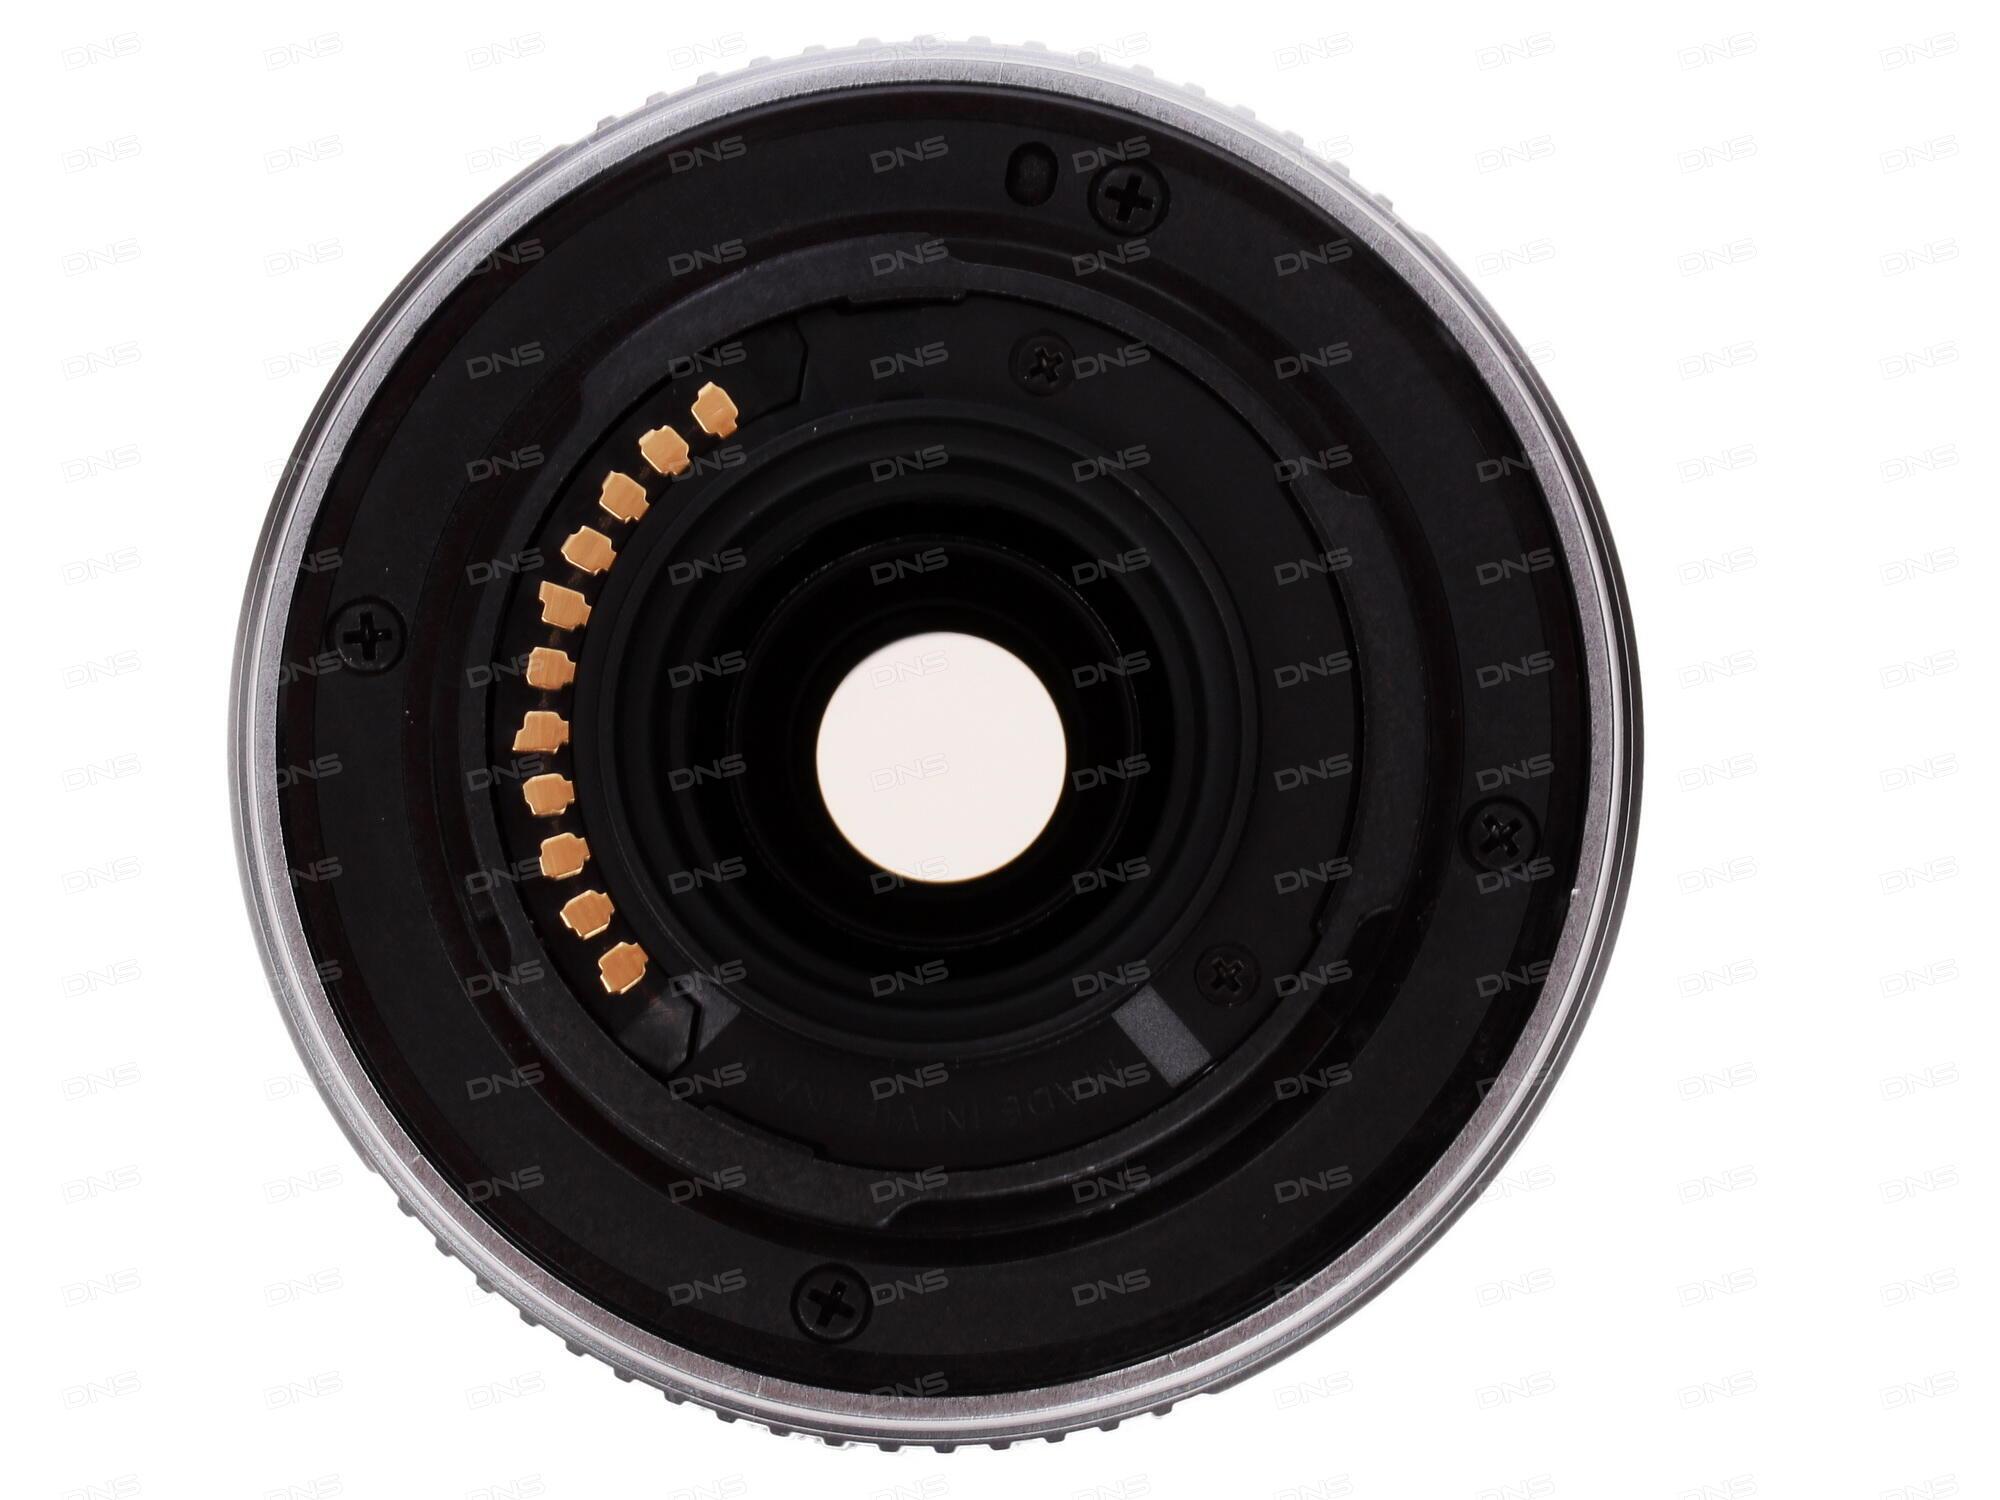 Объектив Olympus M.Zuiko Digital 25 mm f/1.8 for Micro Four Thirds Black*